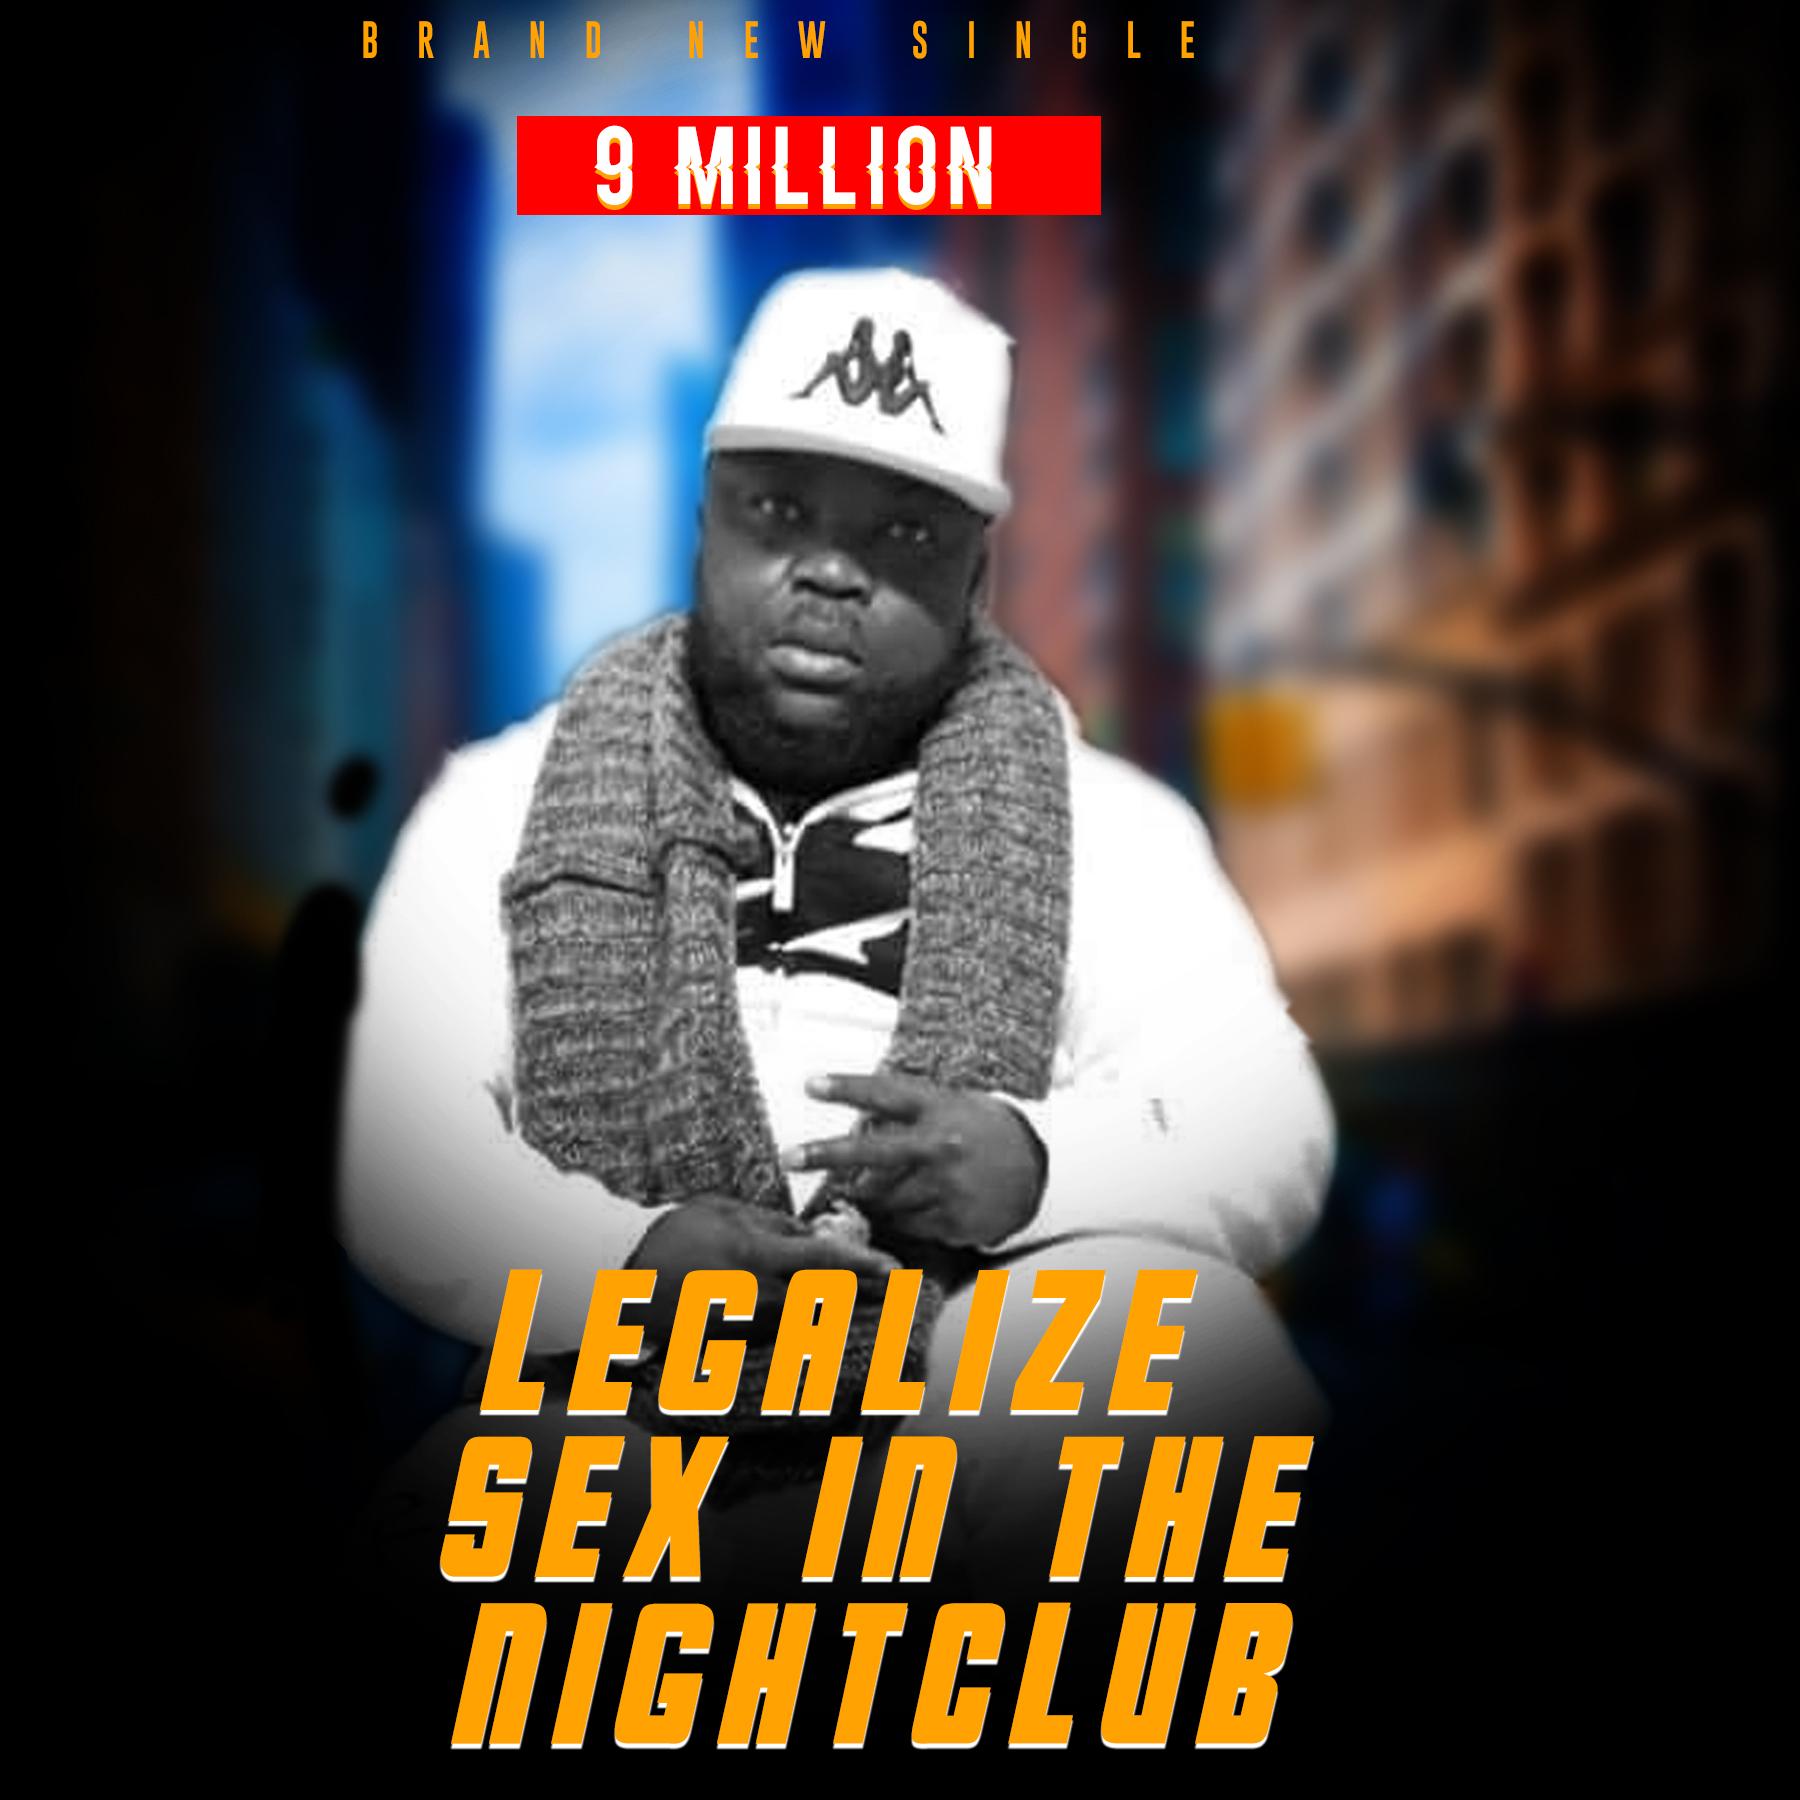 9Million – Legalize Sex In The Nightclub